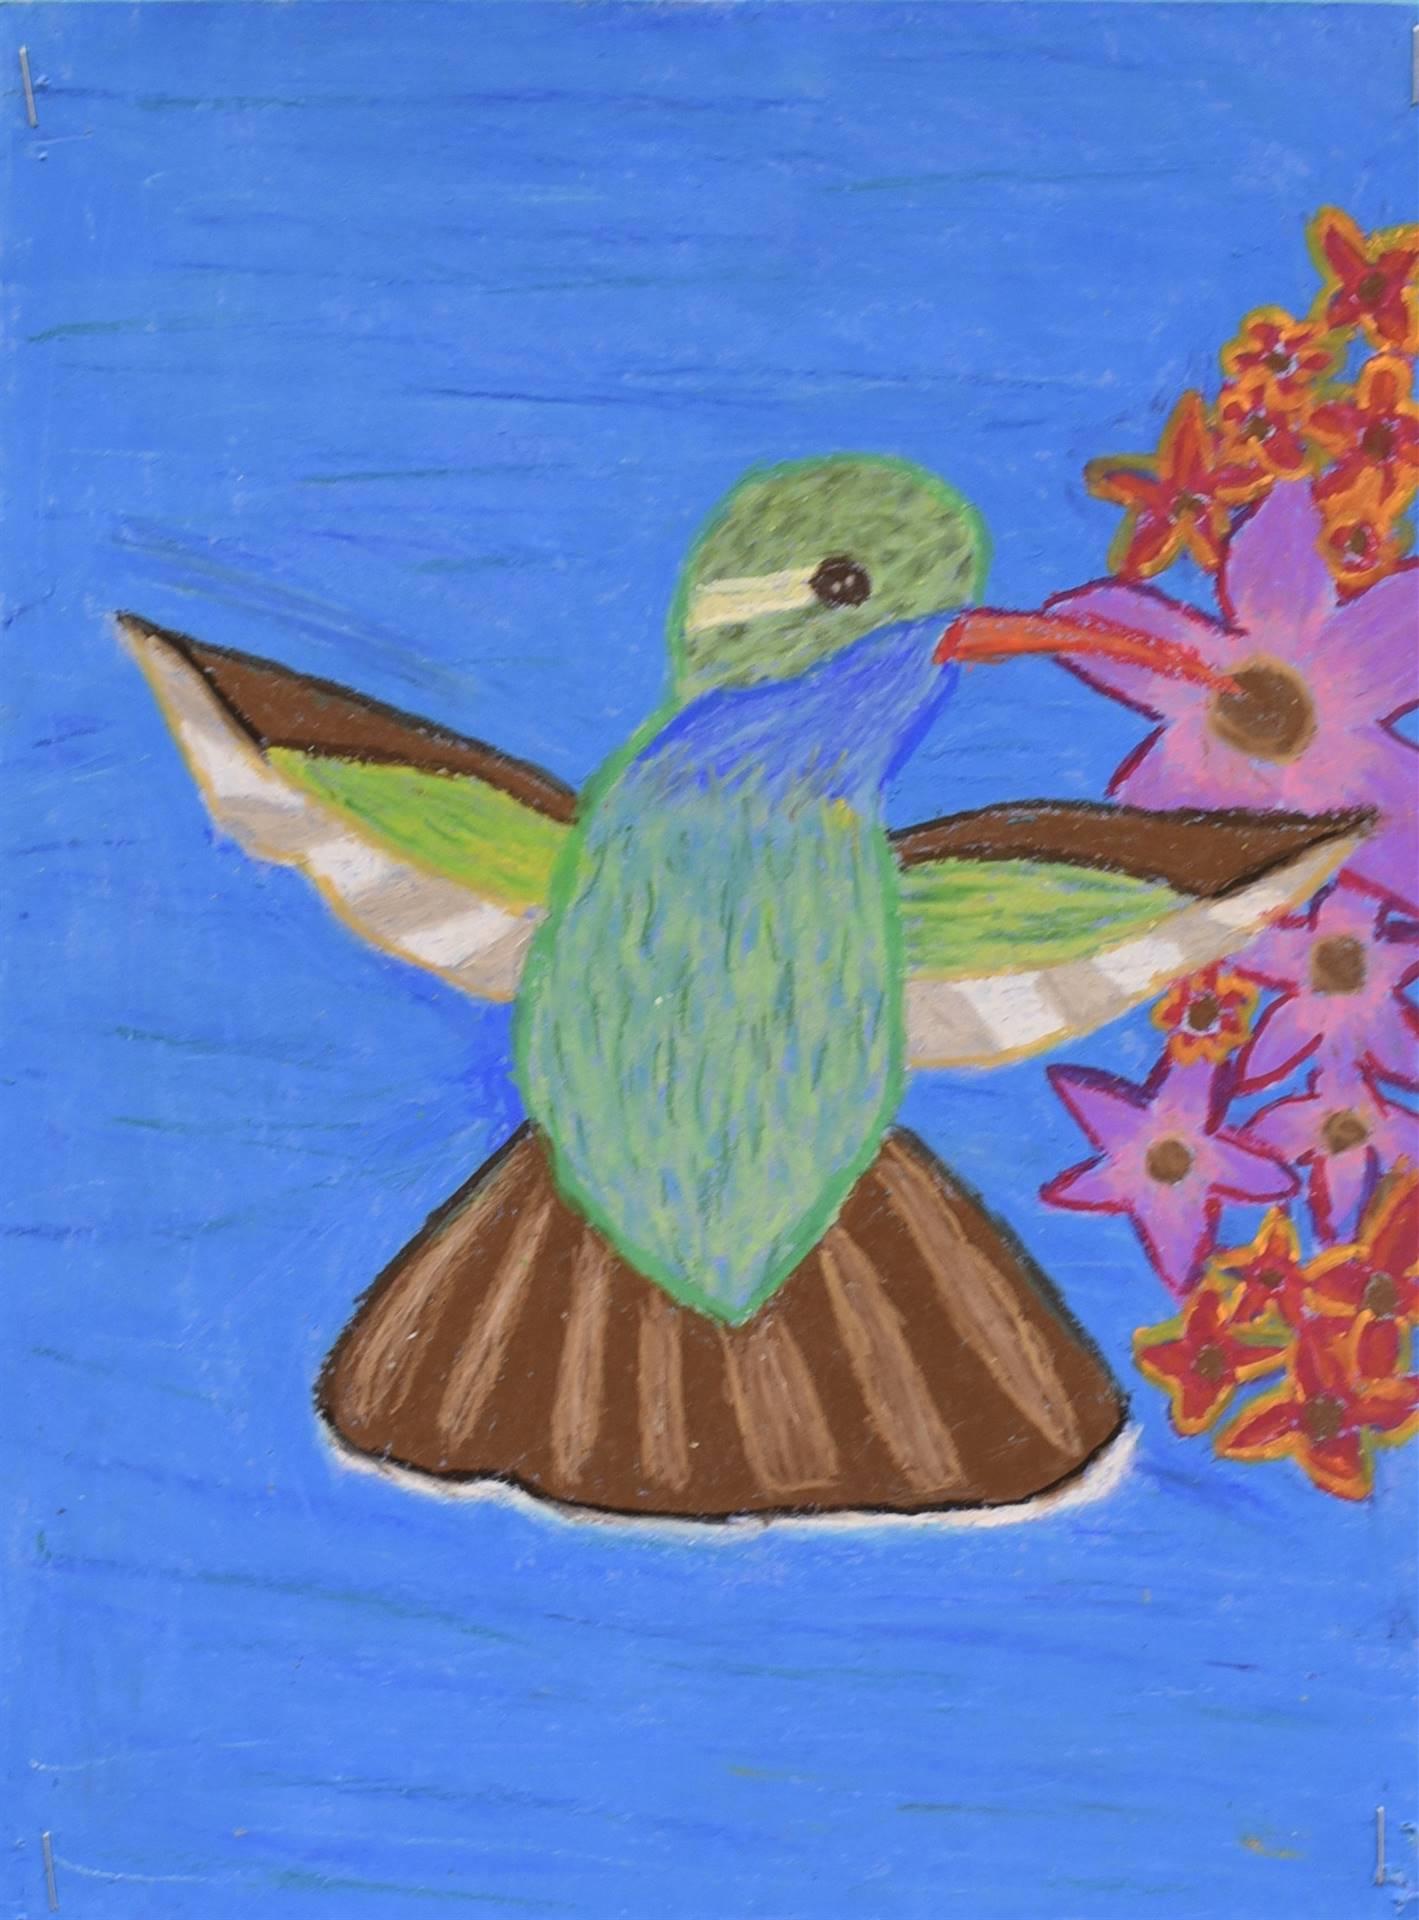 Brecksville-Broadview Hts. Middle School Art Projects 121